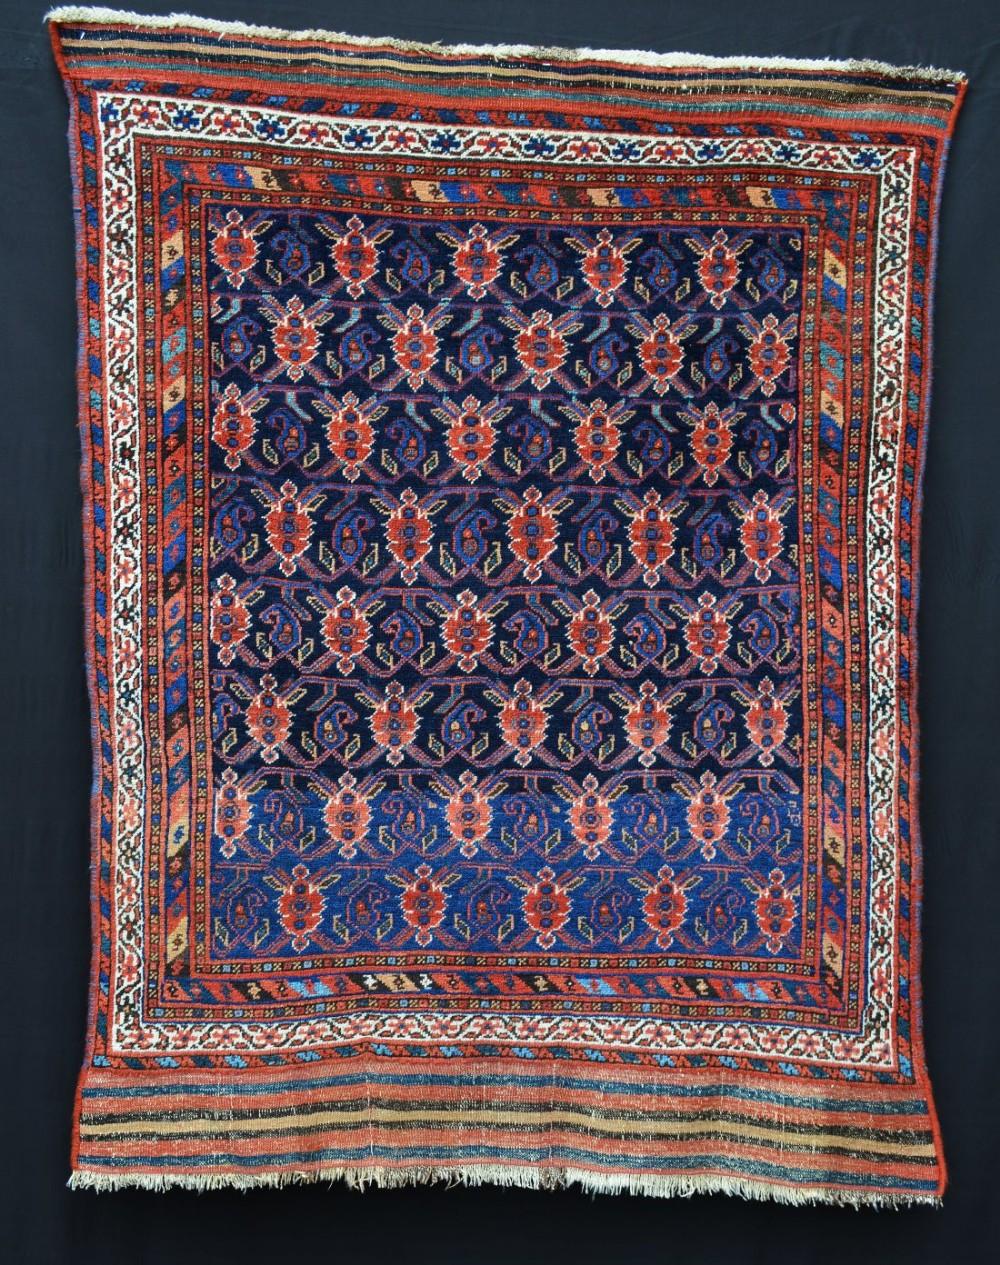 antique afshar tribal rug sirjan kerman province southern persia